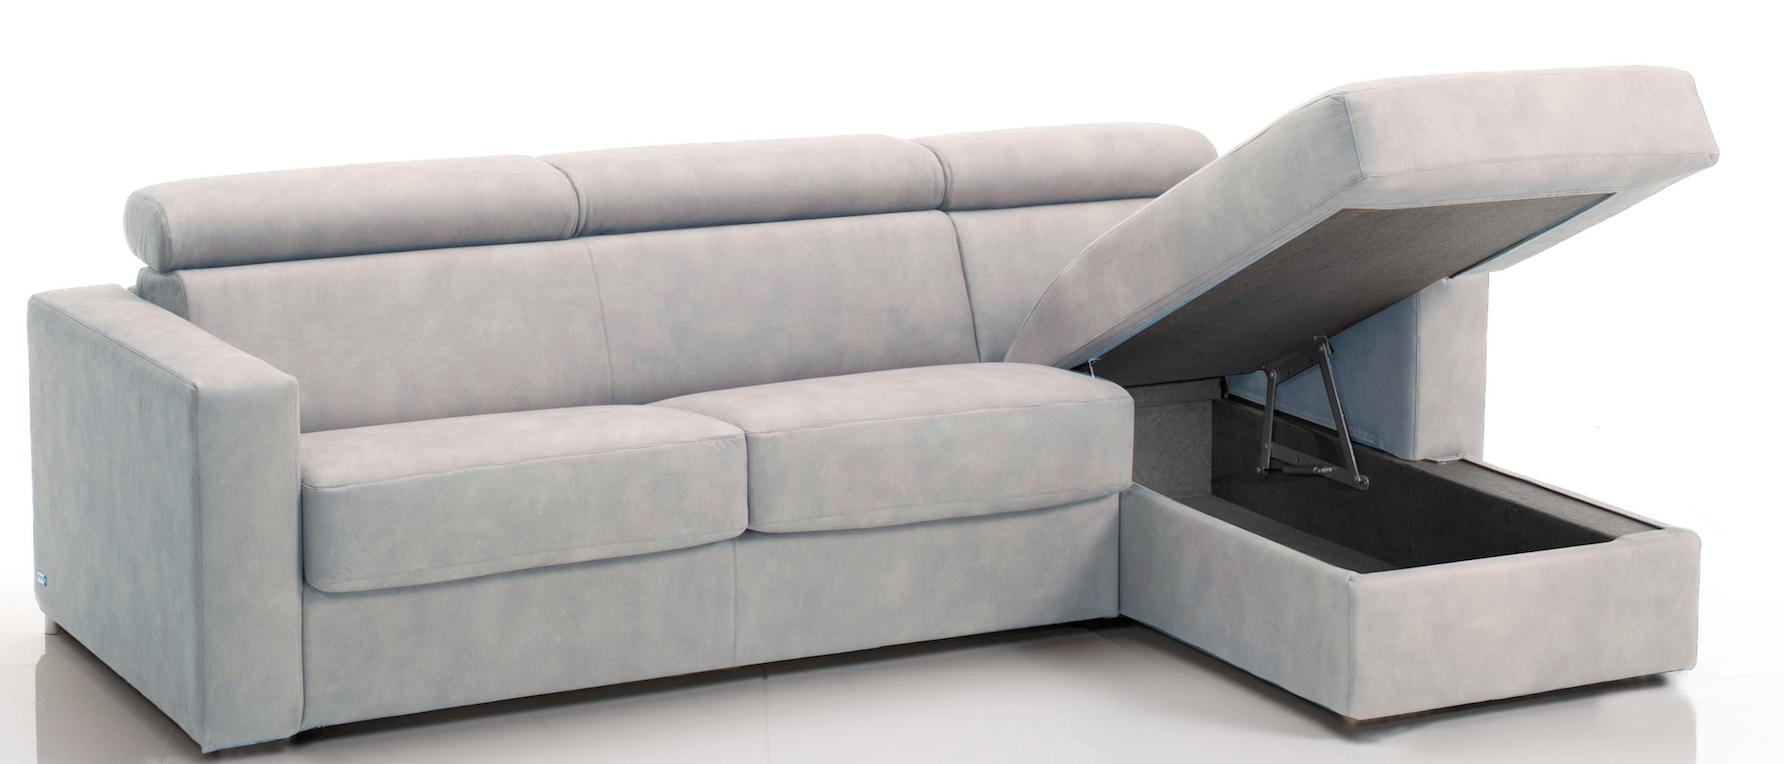 canap d 39 angle convertible avec t ti res rev tement tissu gris clair lova mod le 3 places maxi. Black Bedroom Furniture Sets. Home Design Ideas